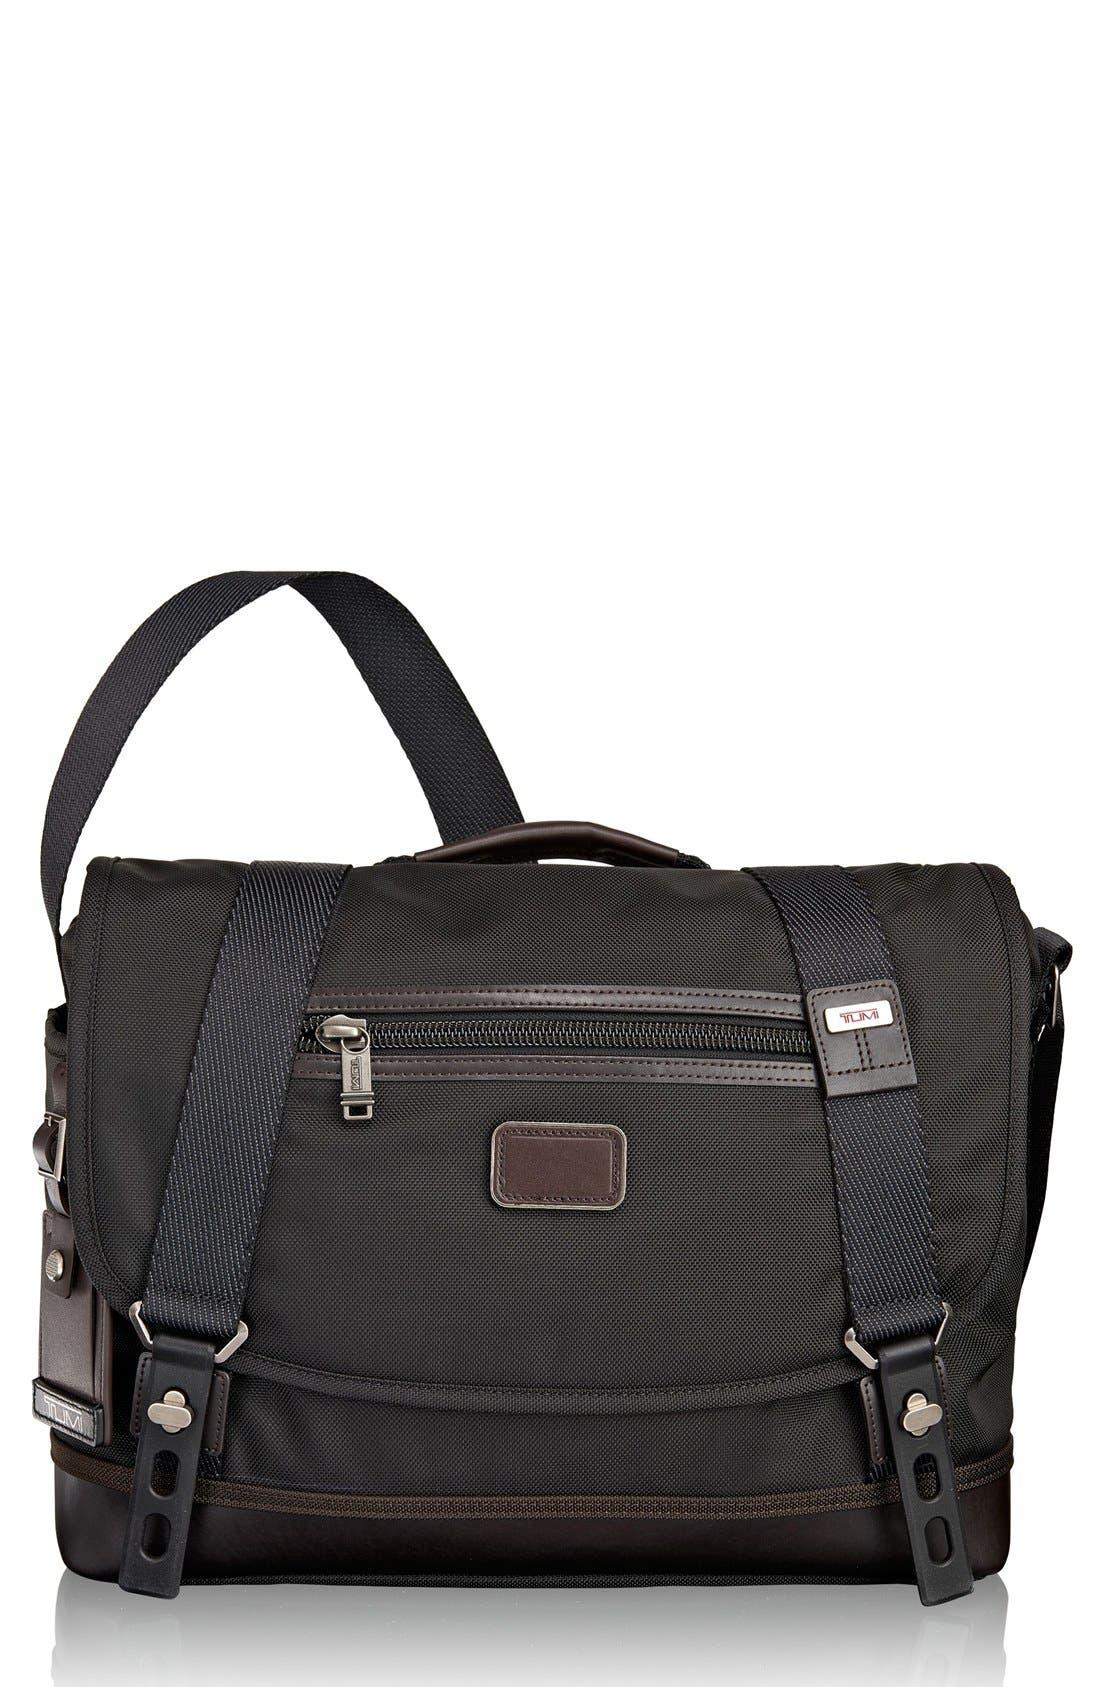 'Alpha Bravo - Foster' Messenger Bag,                         Main,                         color, 001